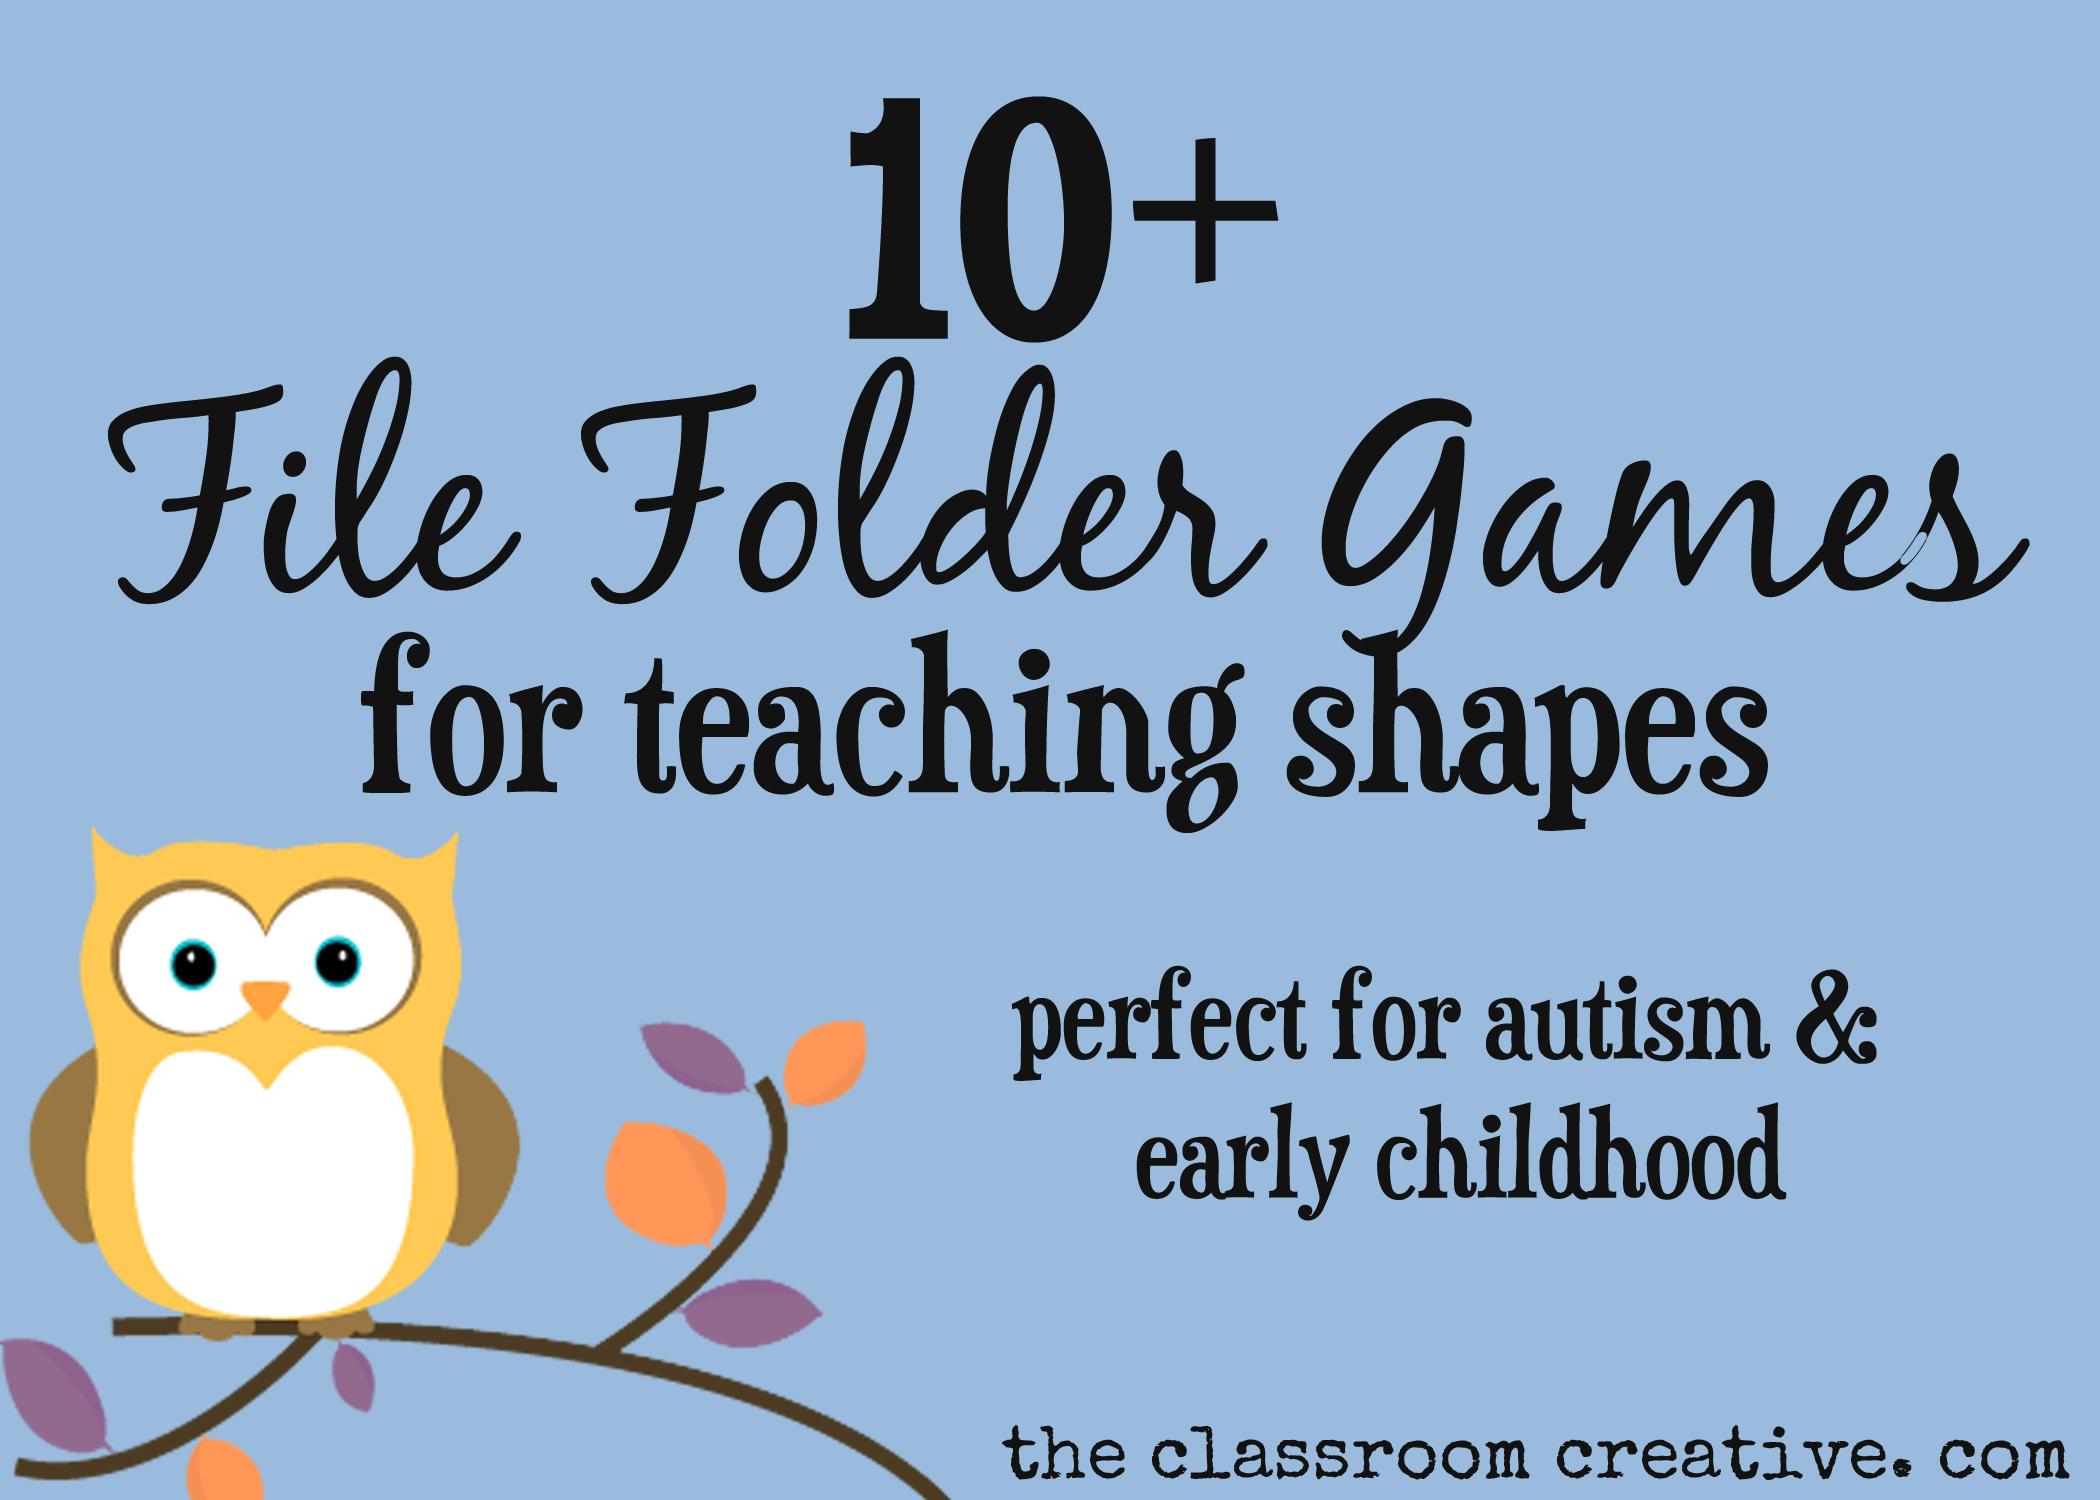 File Folder Games For Teaching Shapes - Free Printable Math File Folder Games For Preschoolers